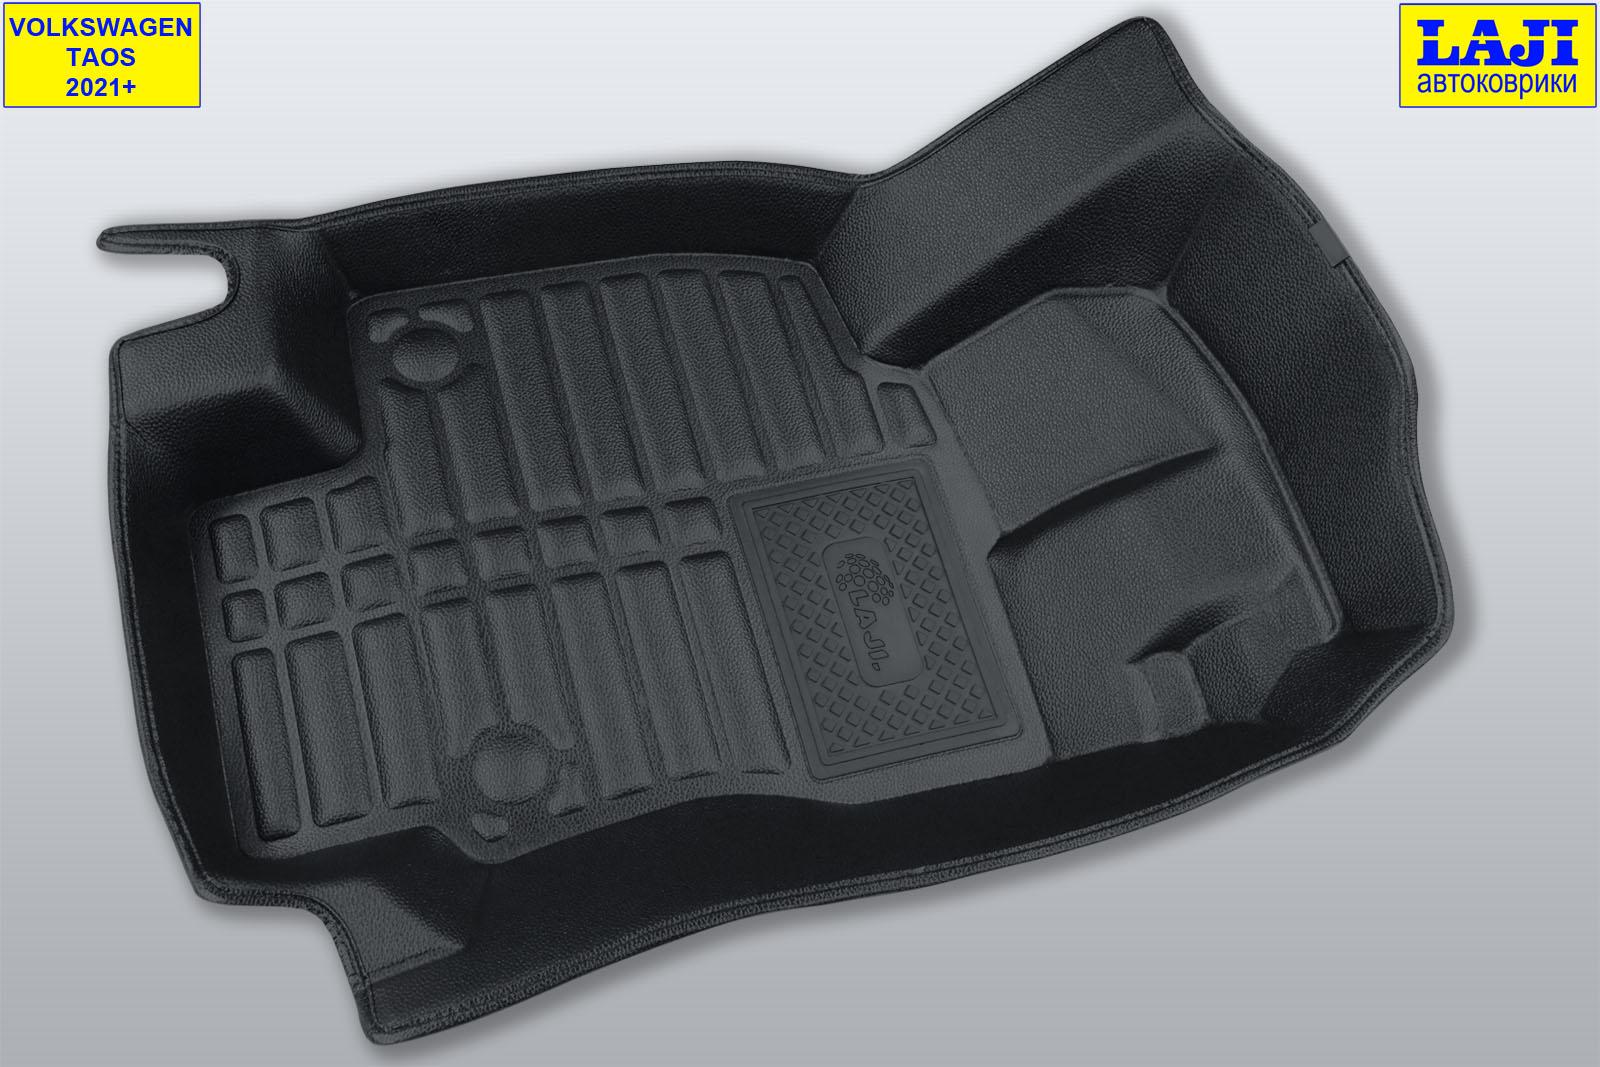 5D коврики в салон Volkswagen Taos 2021-н.в. 2